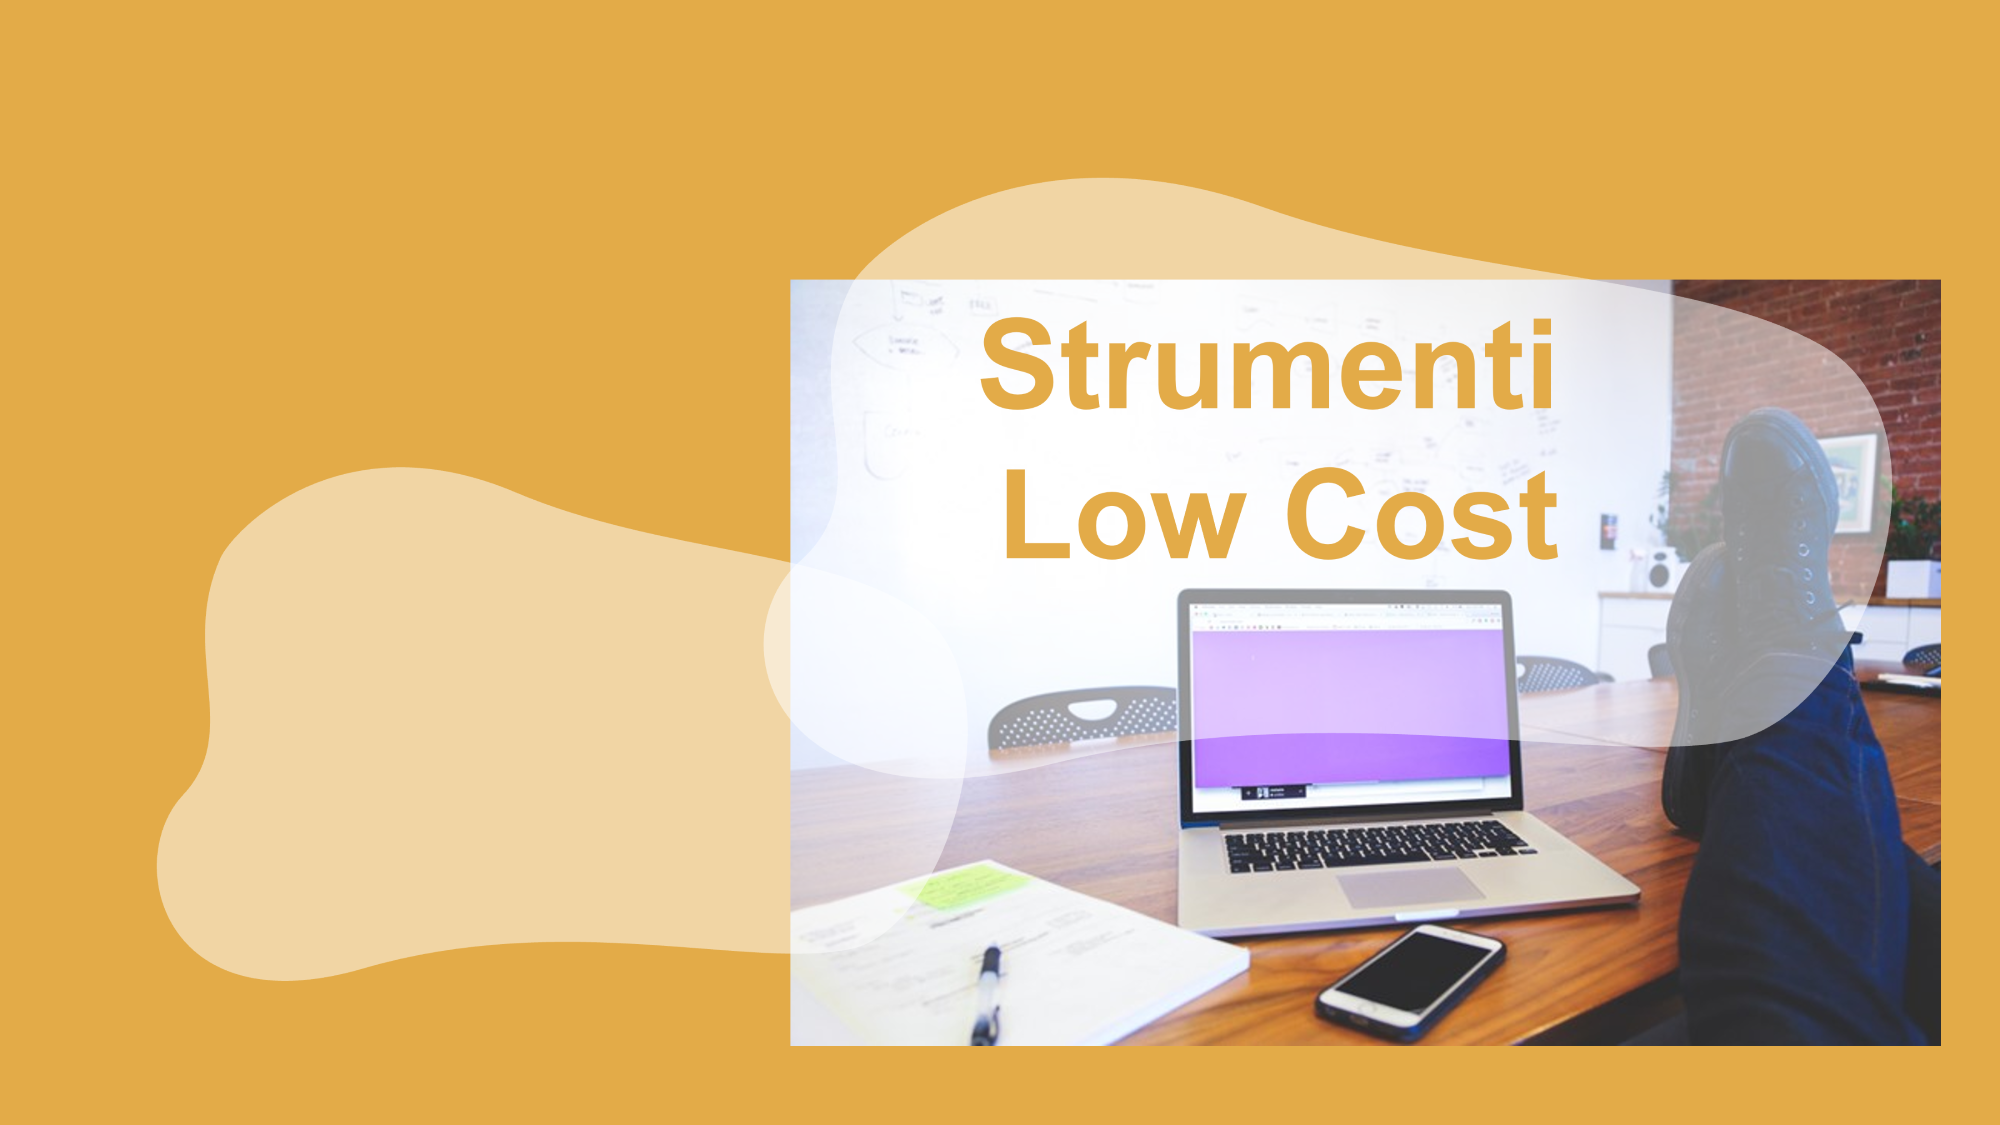 Strumenti Low Cost